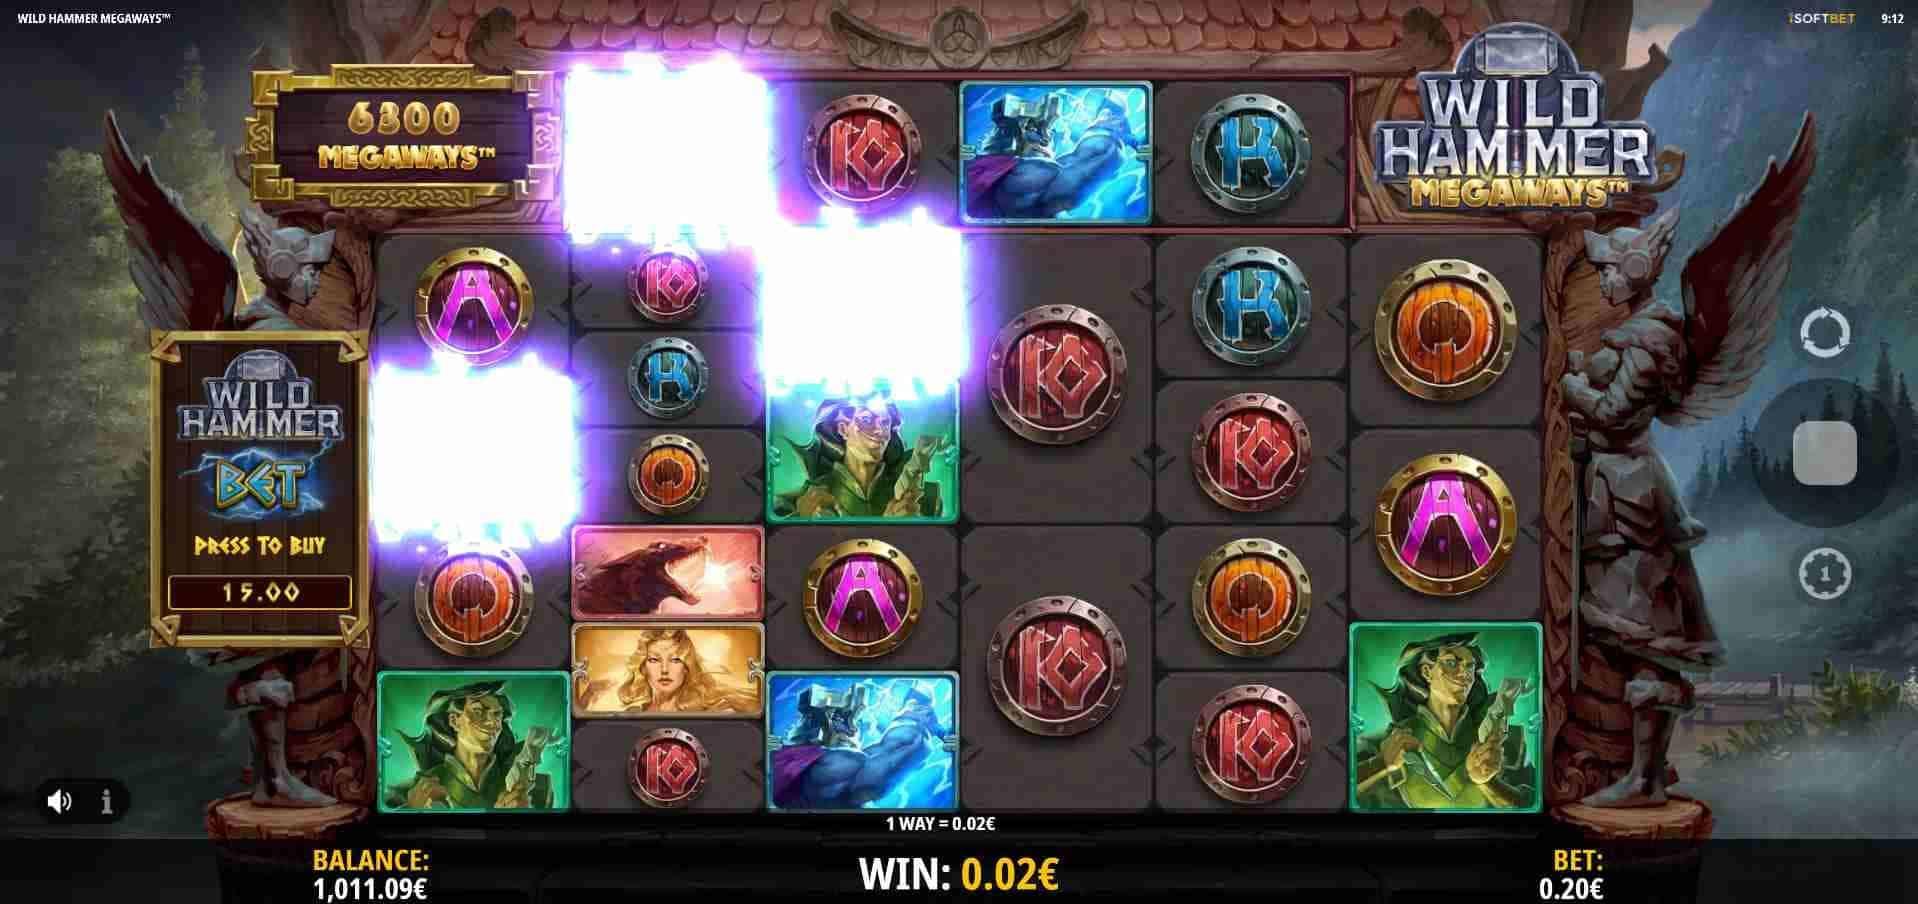 Wild Hammer Megaways Base Game